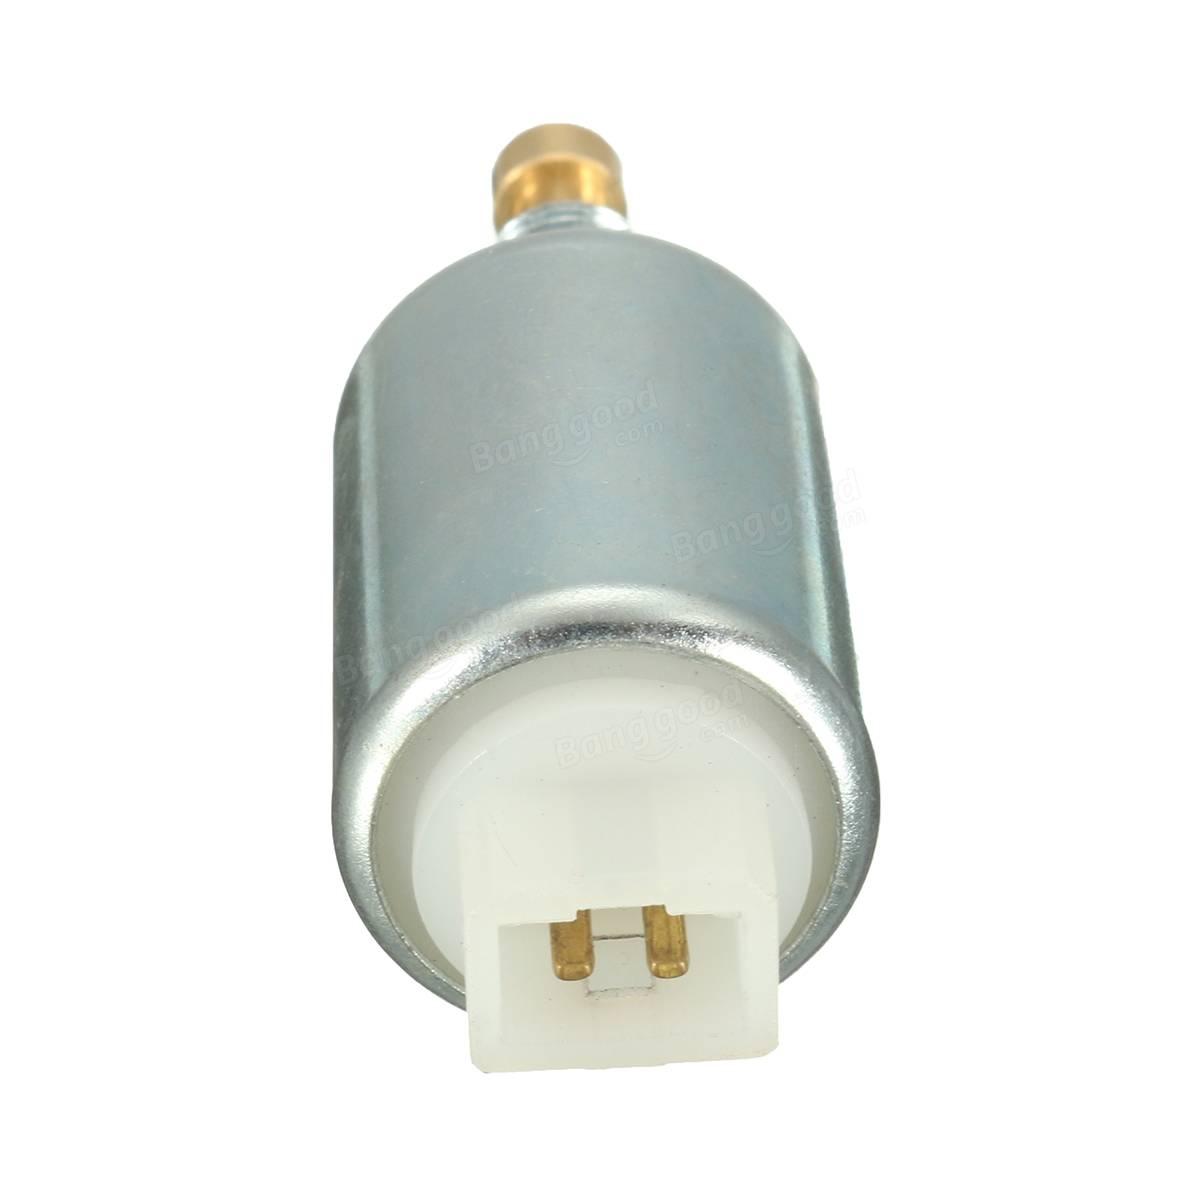 briggs and stratton nikki carburetor warn 62135 wiring diagram replacement fuel solenoid for